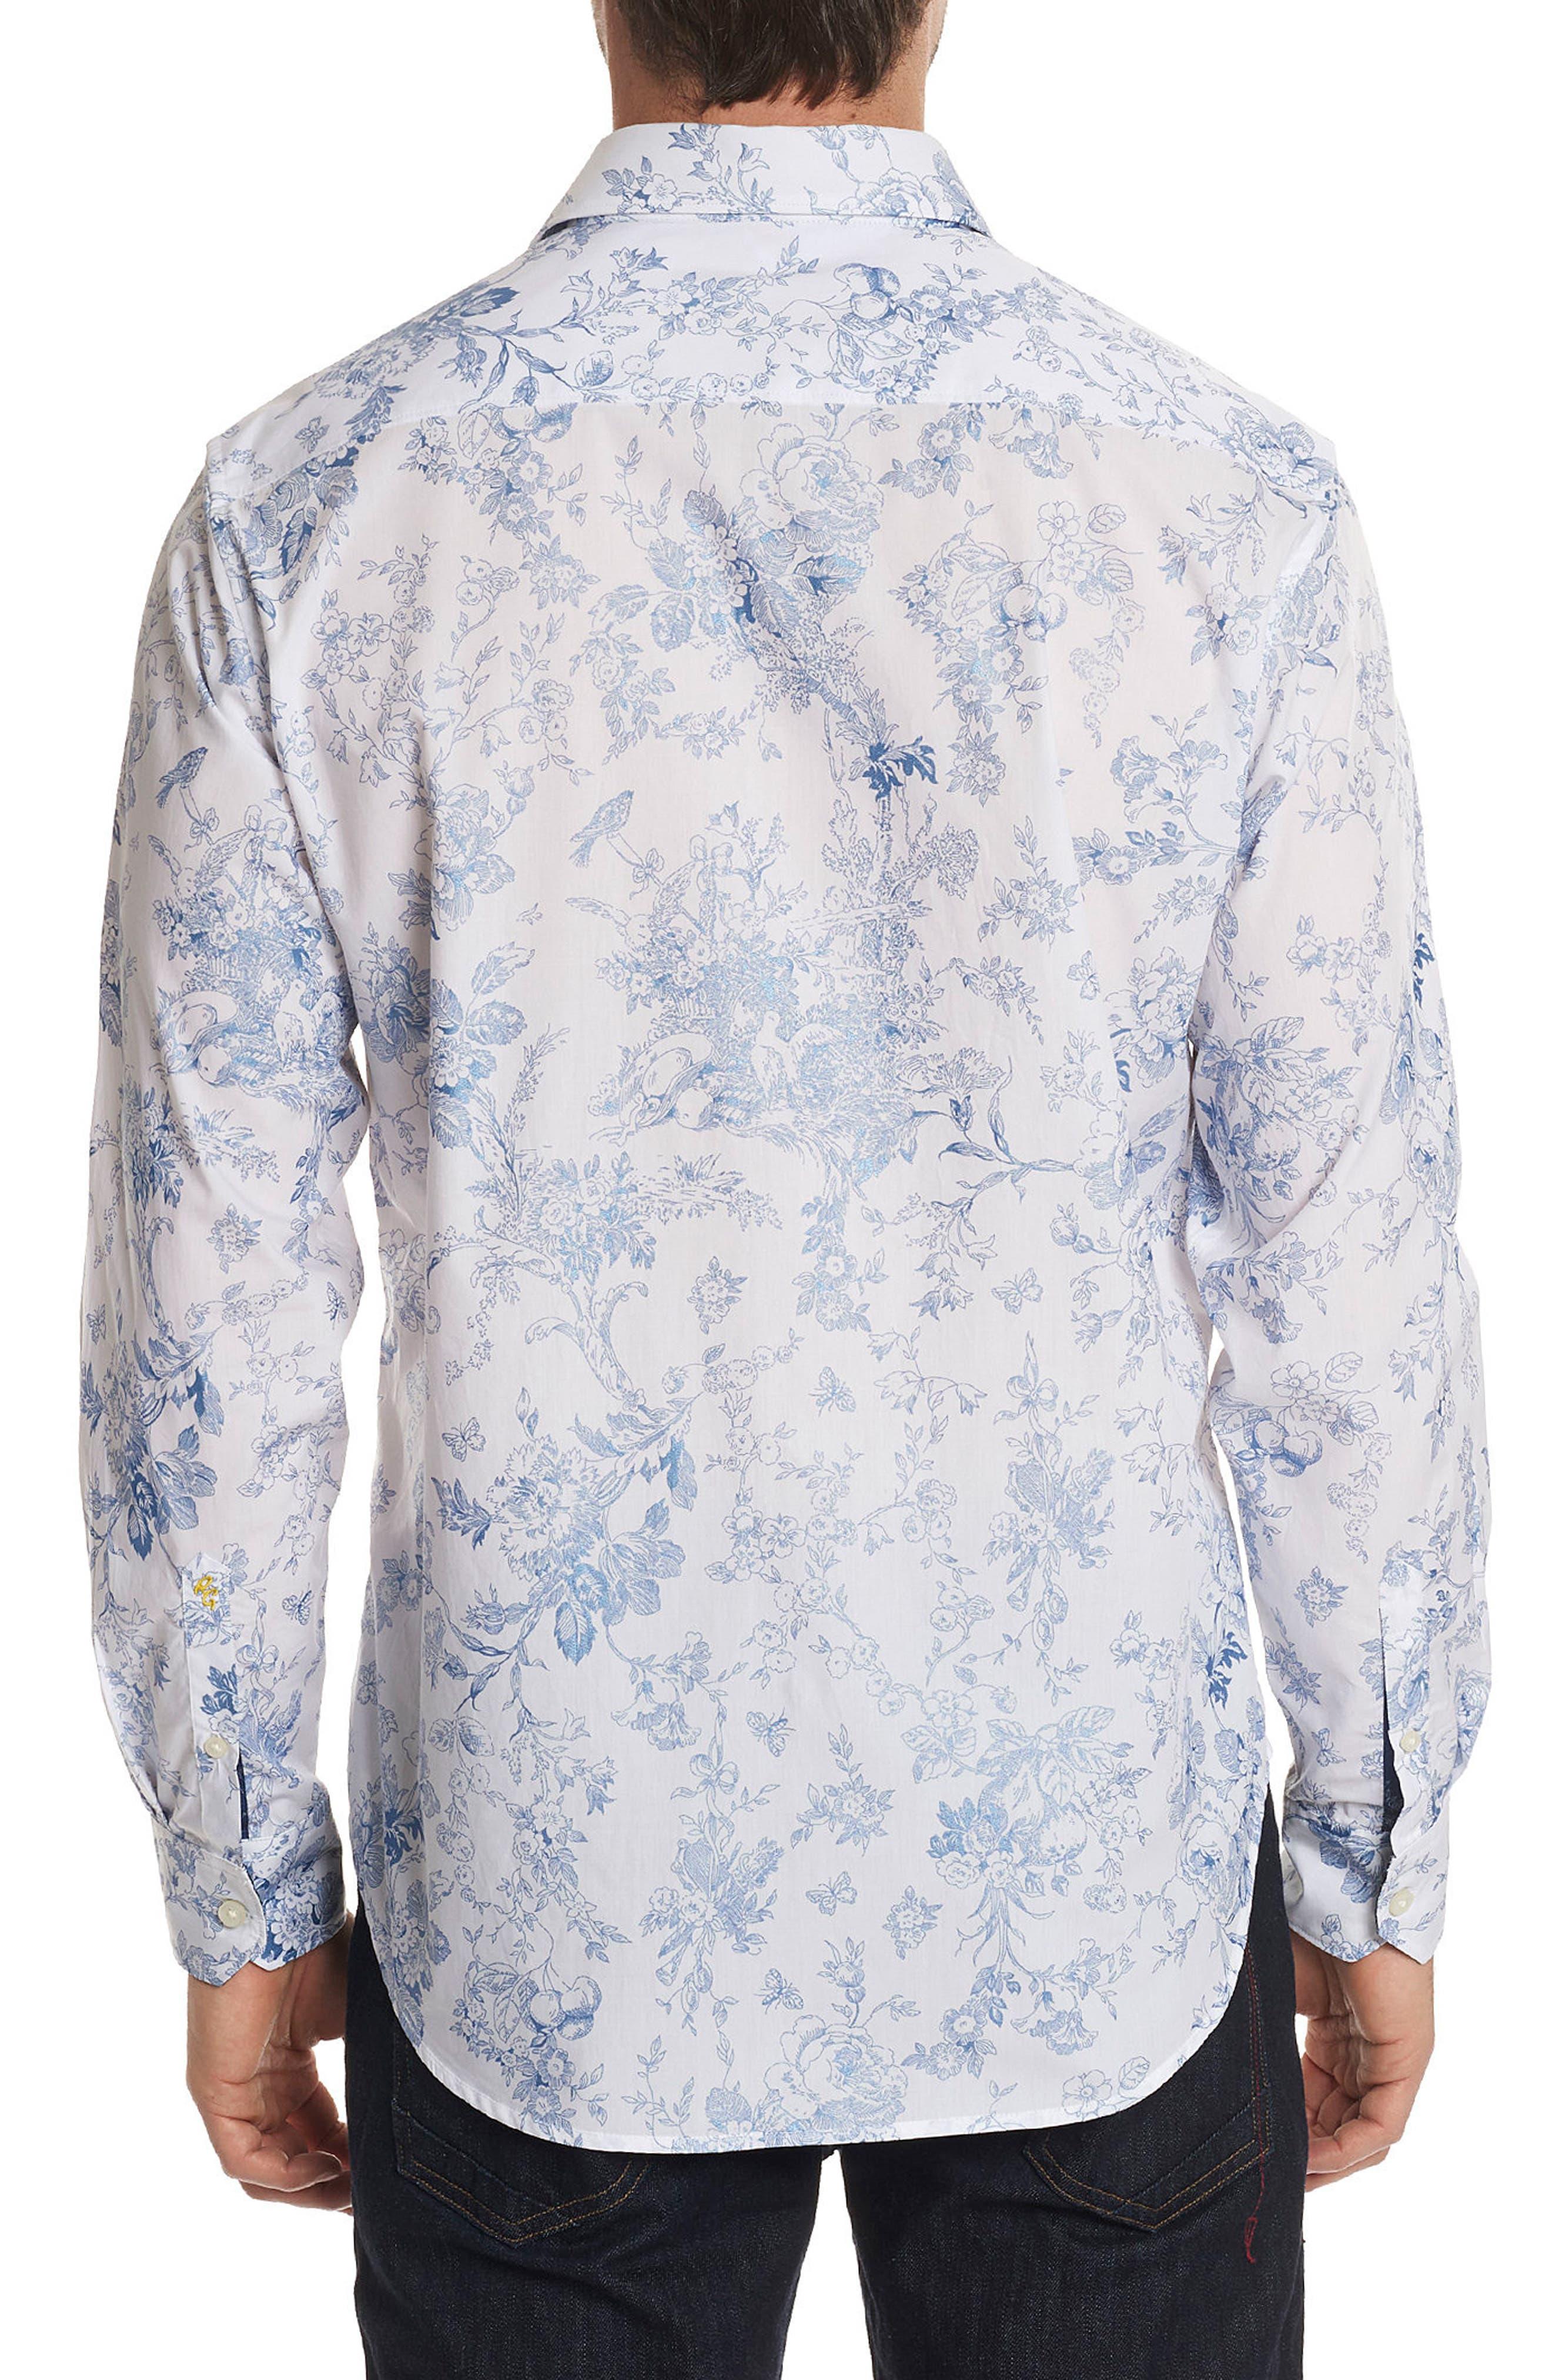 Rider Classic Fit Sport Shirt,                             Alternate thumbnail 2, color,                             White